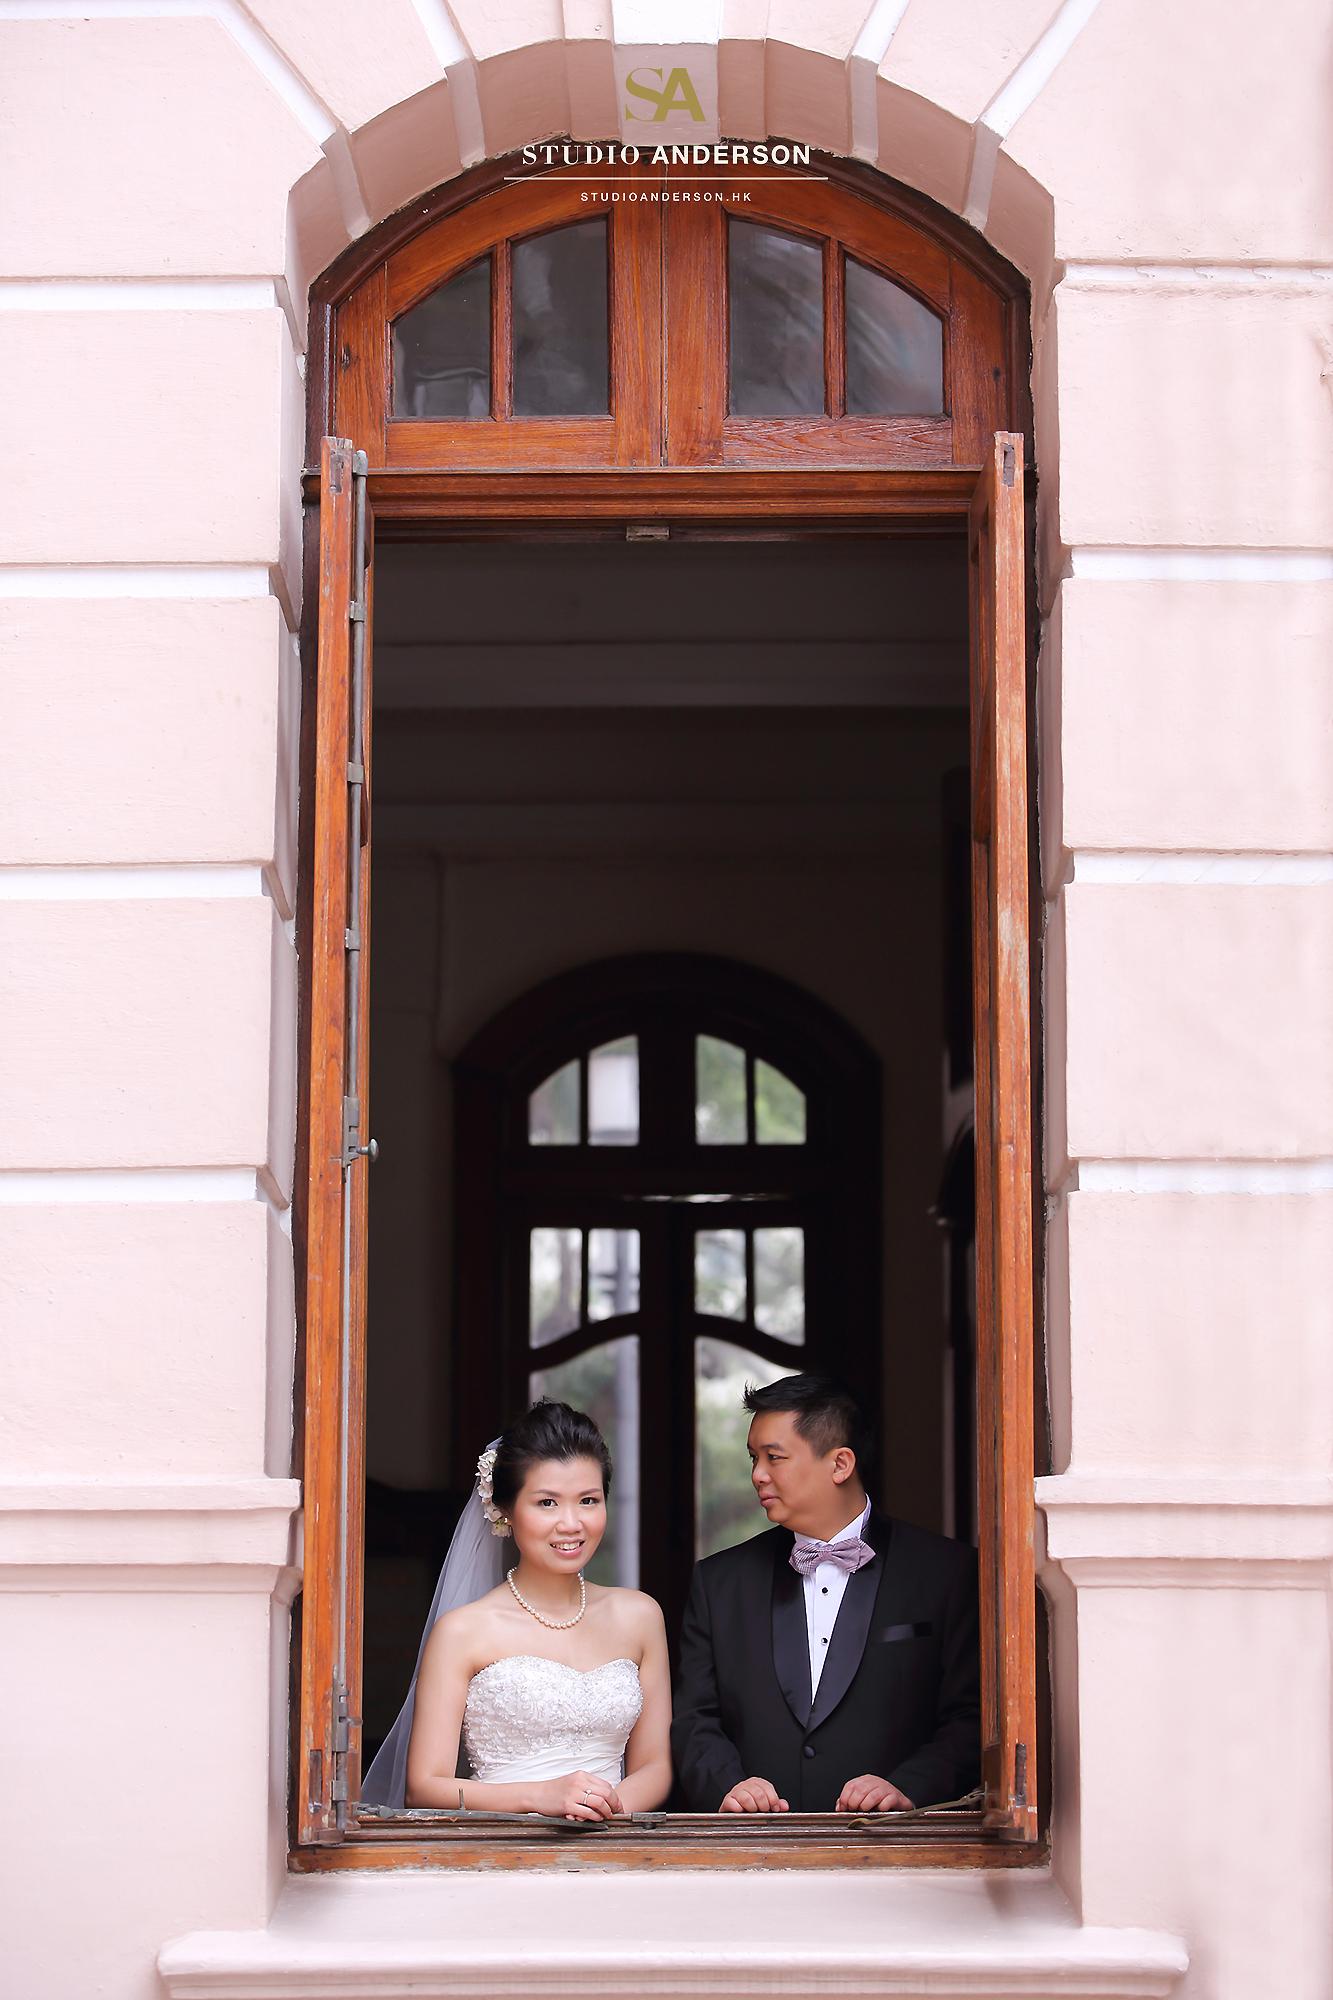 029 - Mandy and Joe Engagement (Watermark).jpg